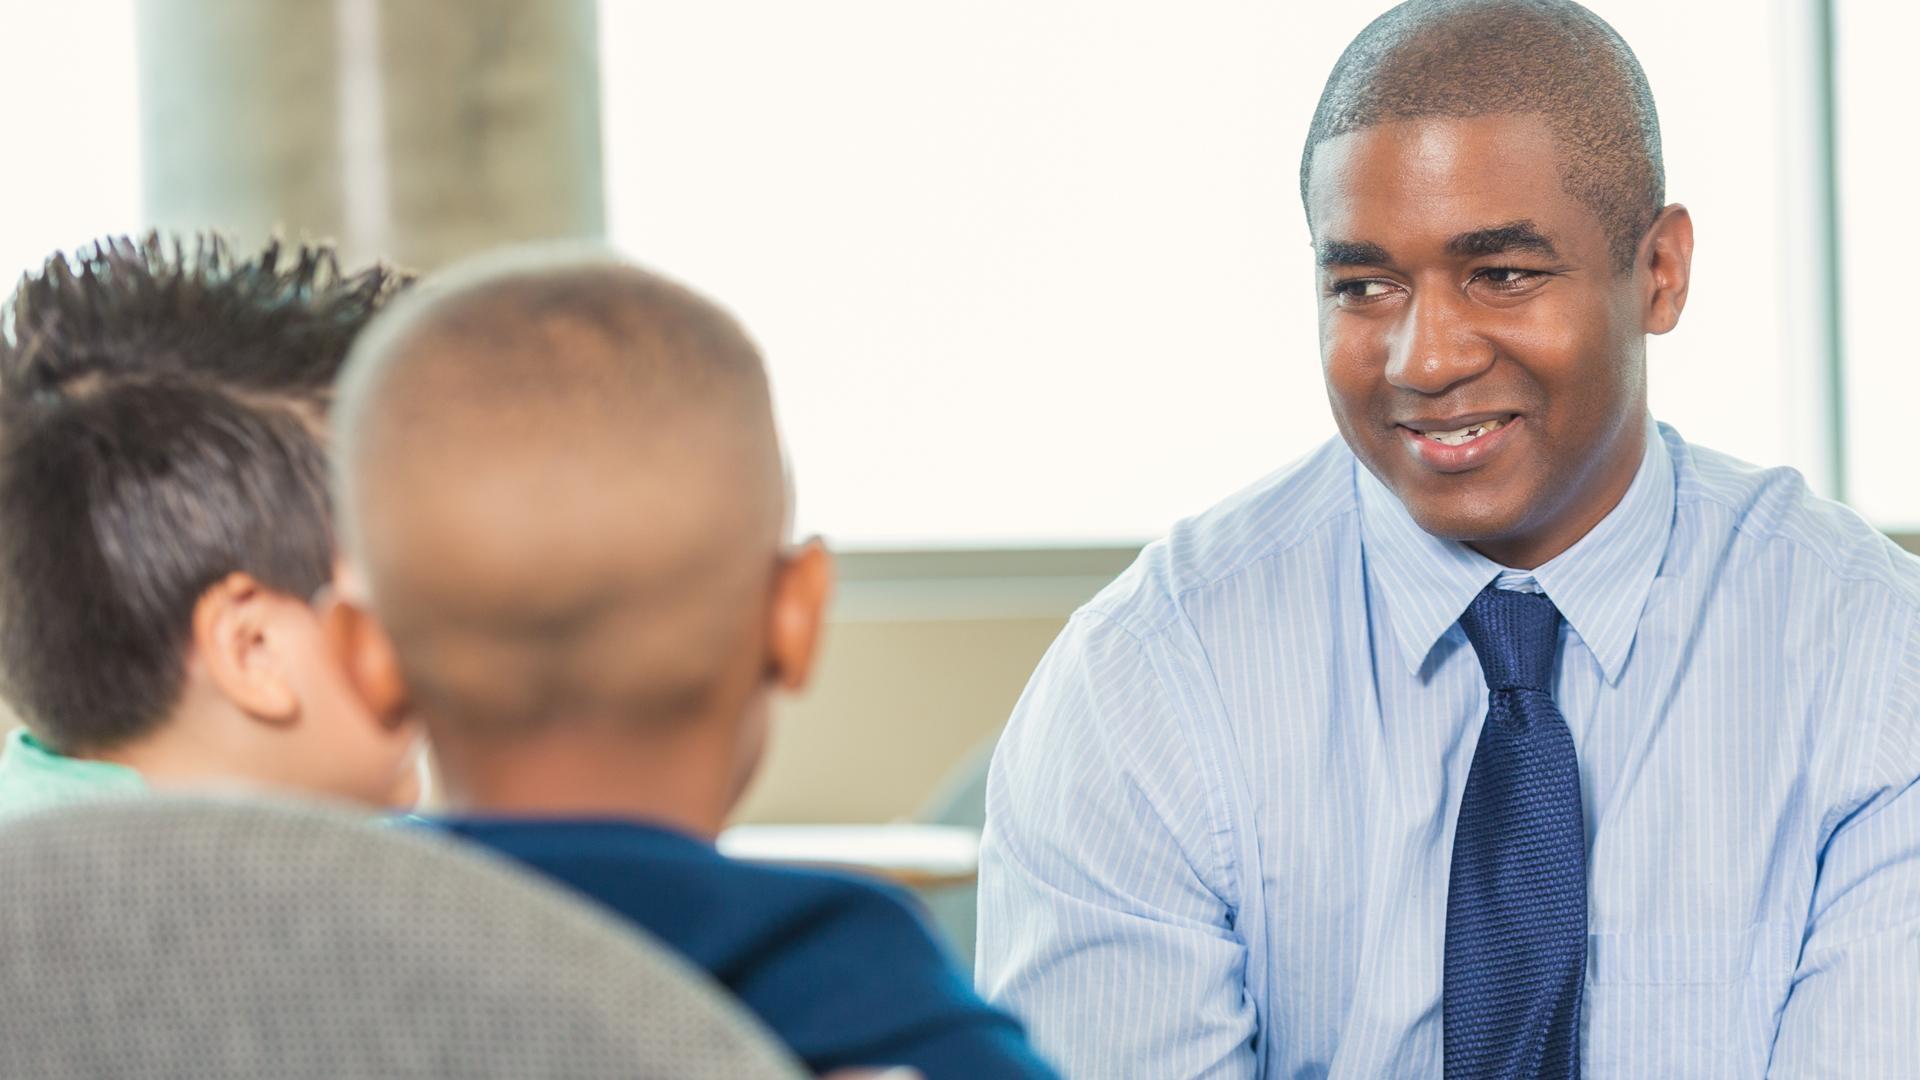 Doctor of Education in Organizational Leadership